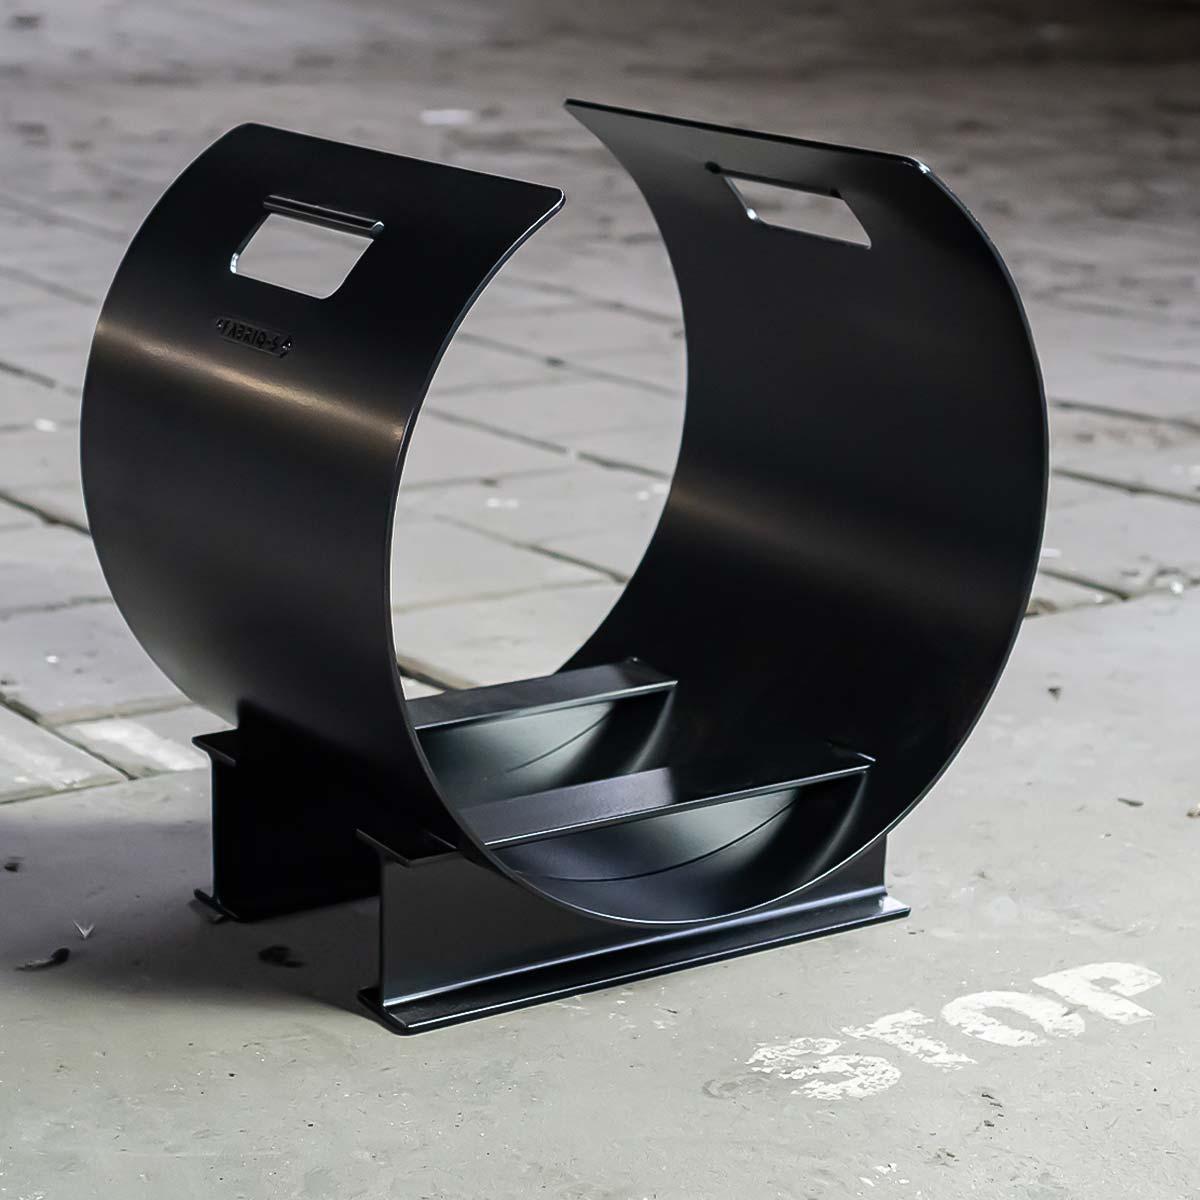 Houtopslag design zwart staal - mooie houtopslag THE BLOCKZ - FABRIQ-S - sfeerfoto full image MOBILE